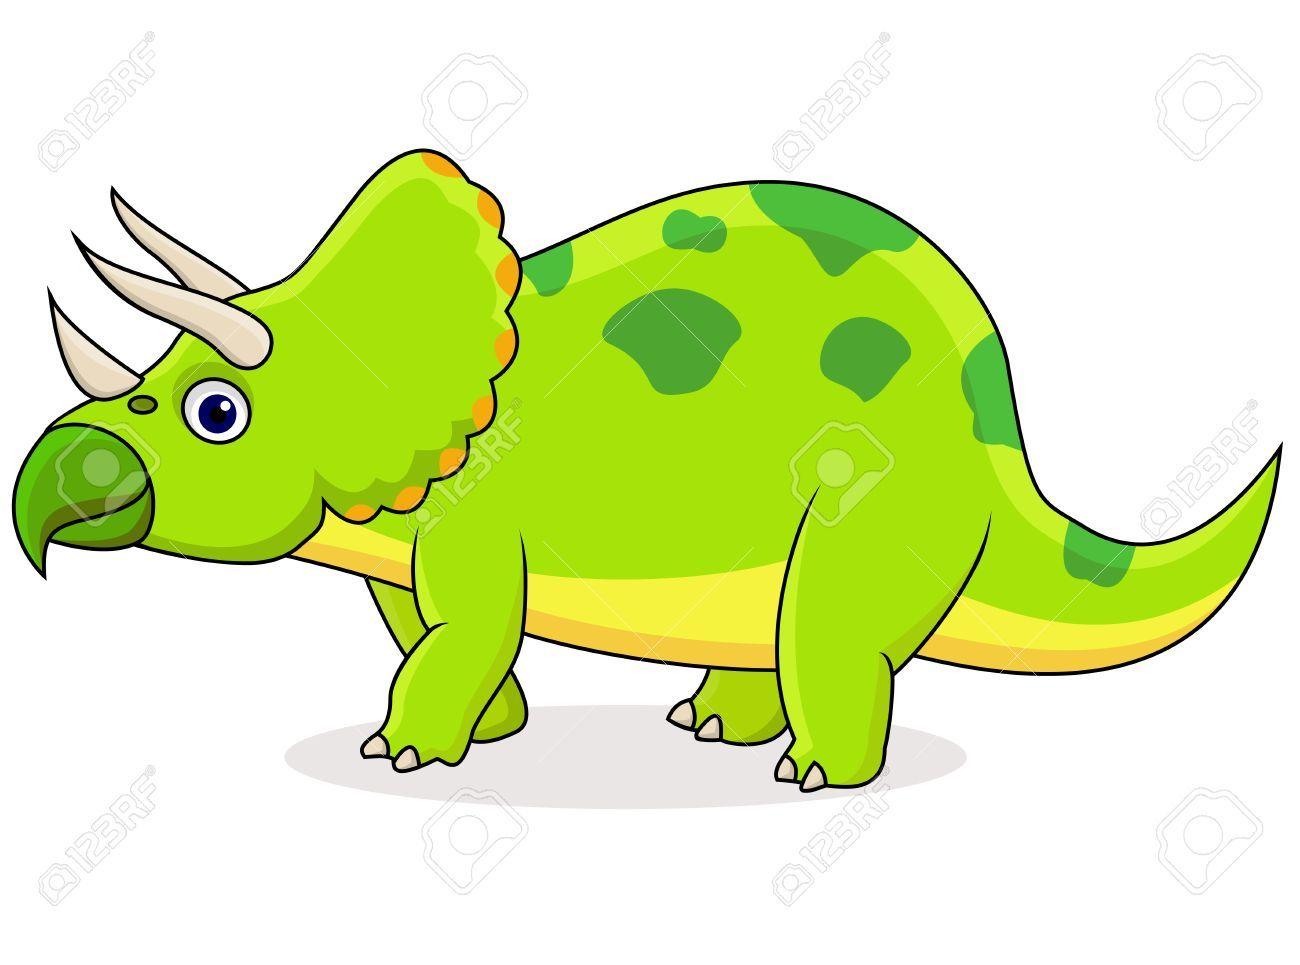 Triceratops clipart » Clipart Portal.